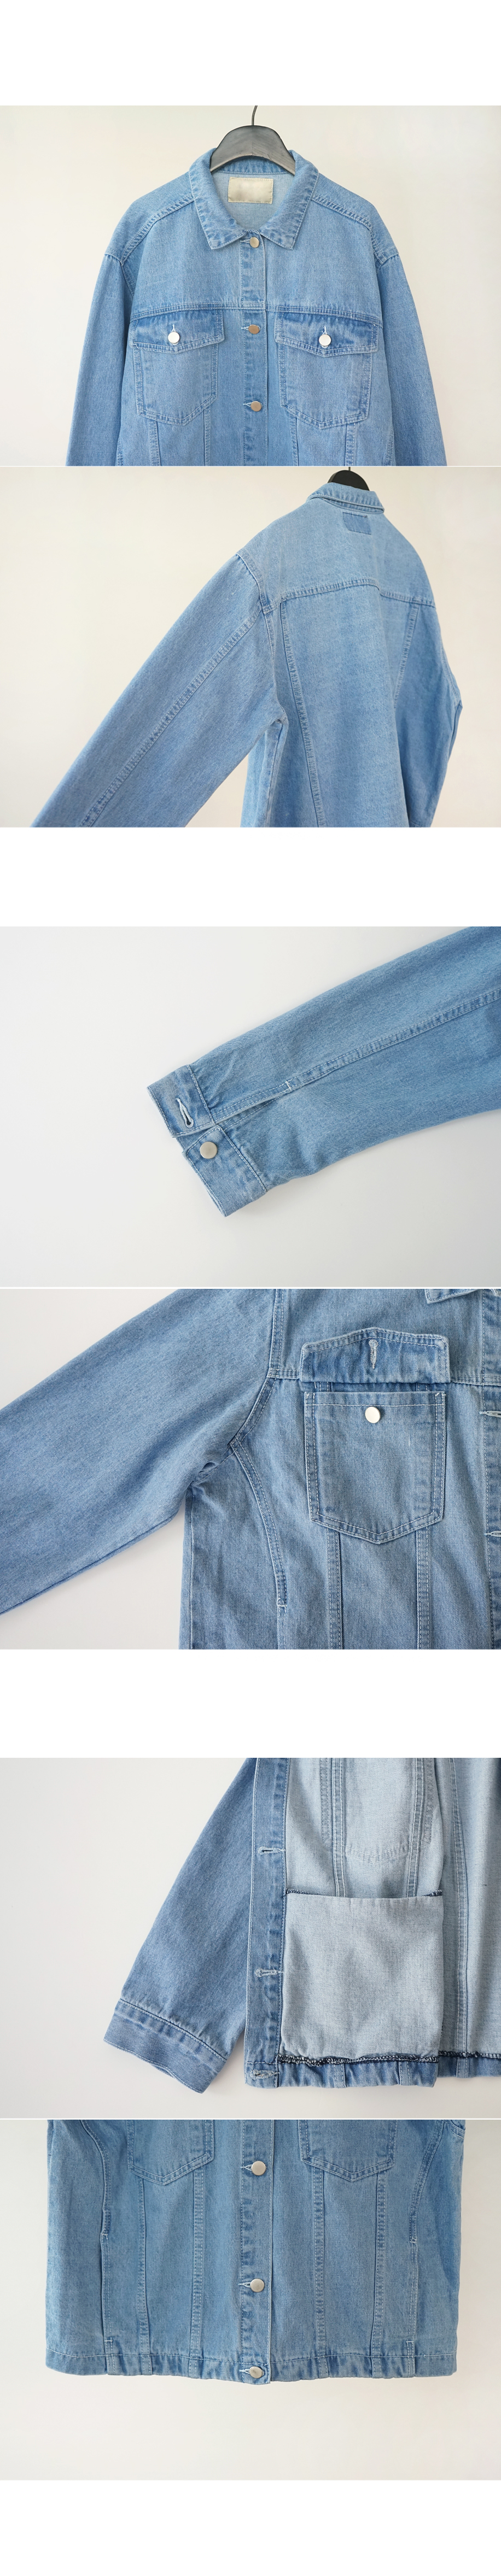 boyish mood denim jacket (2colors)